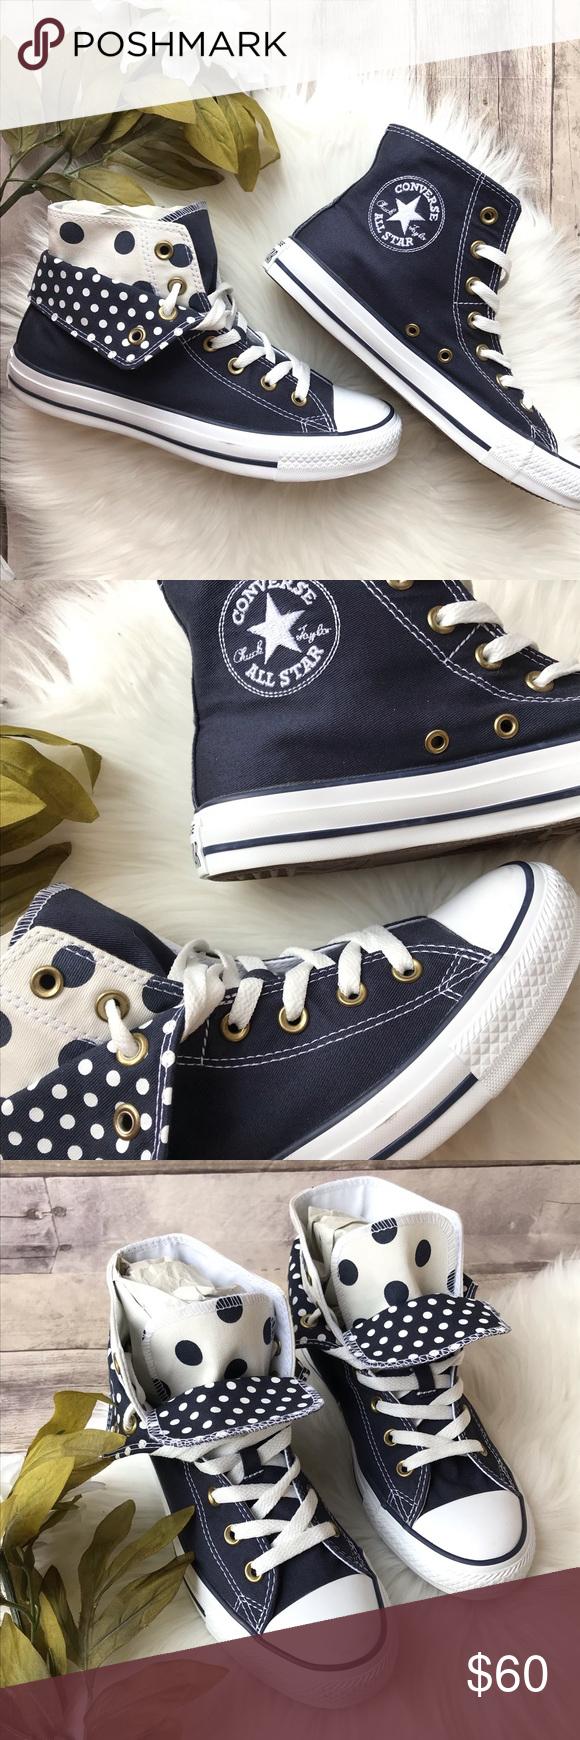 Converse double tongue navy polka dot high tops Brand